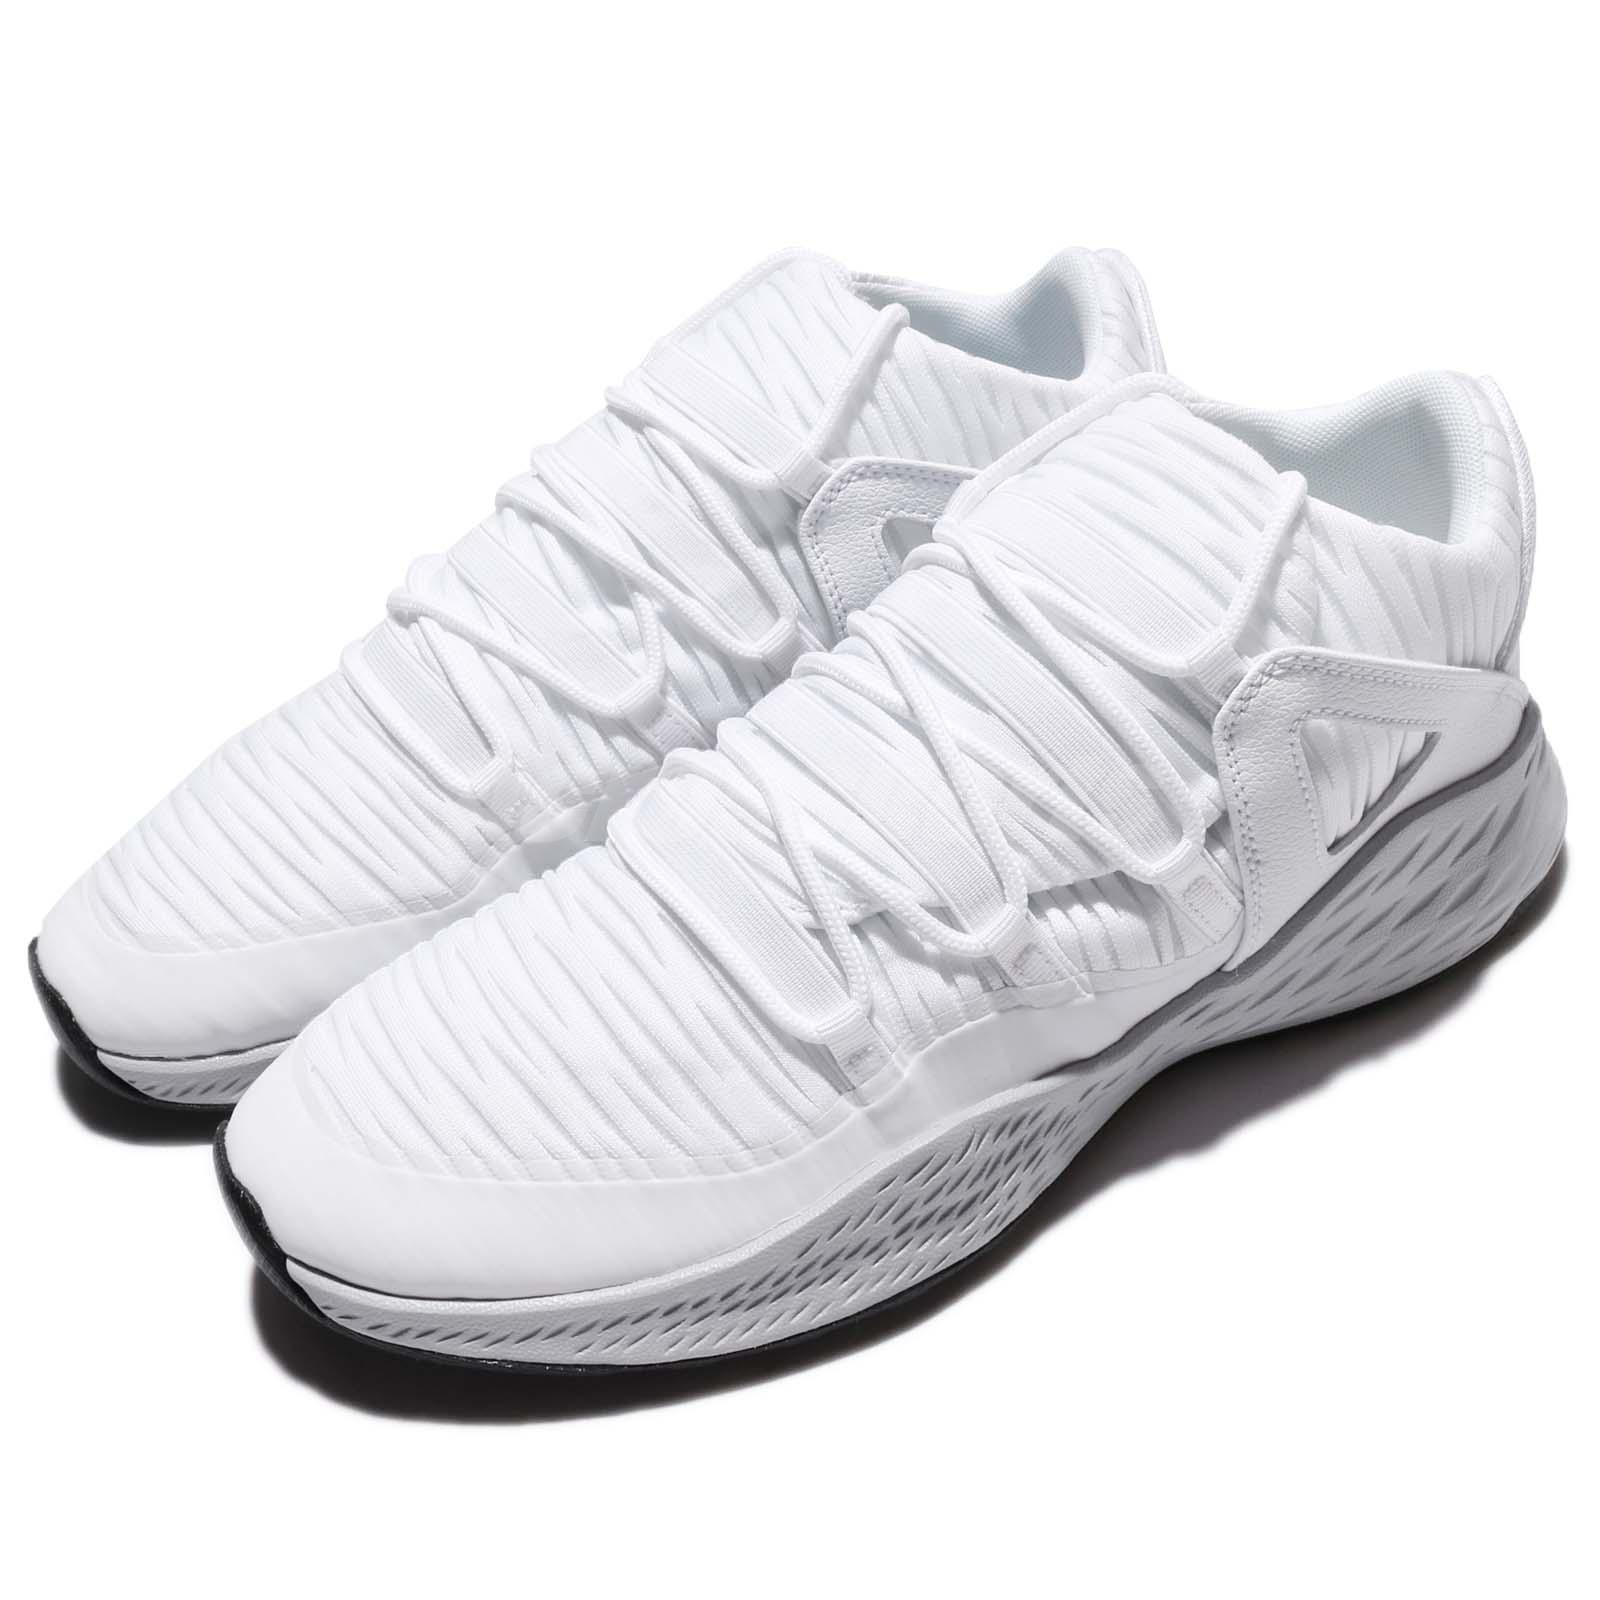 Nike Jordan Formula 23 Low White Wolf Grey Men Casual Shoes Sneakers 919724-103